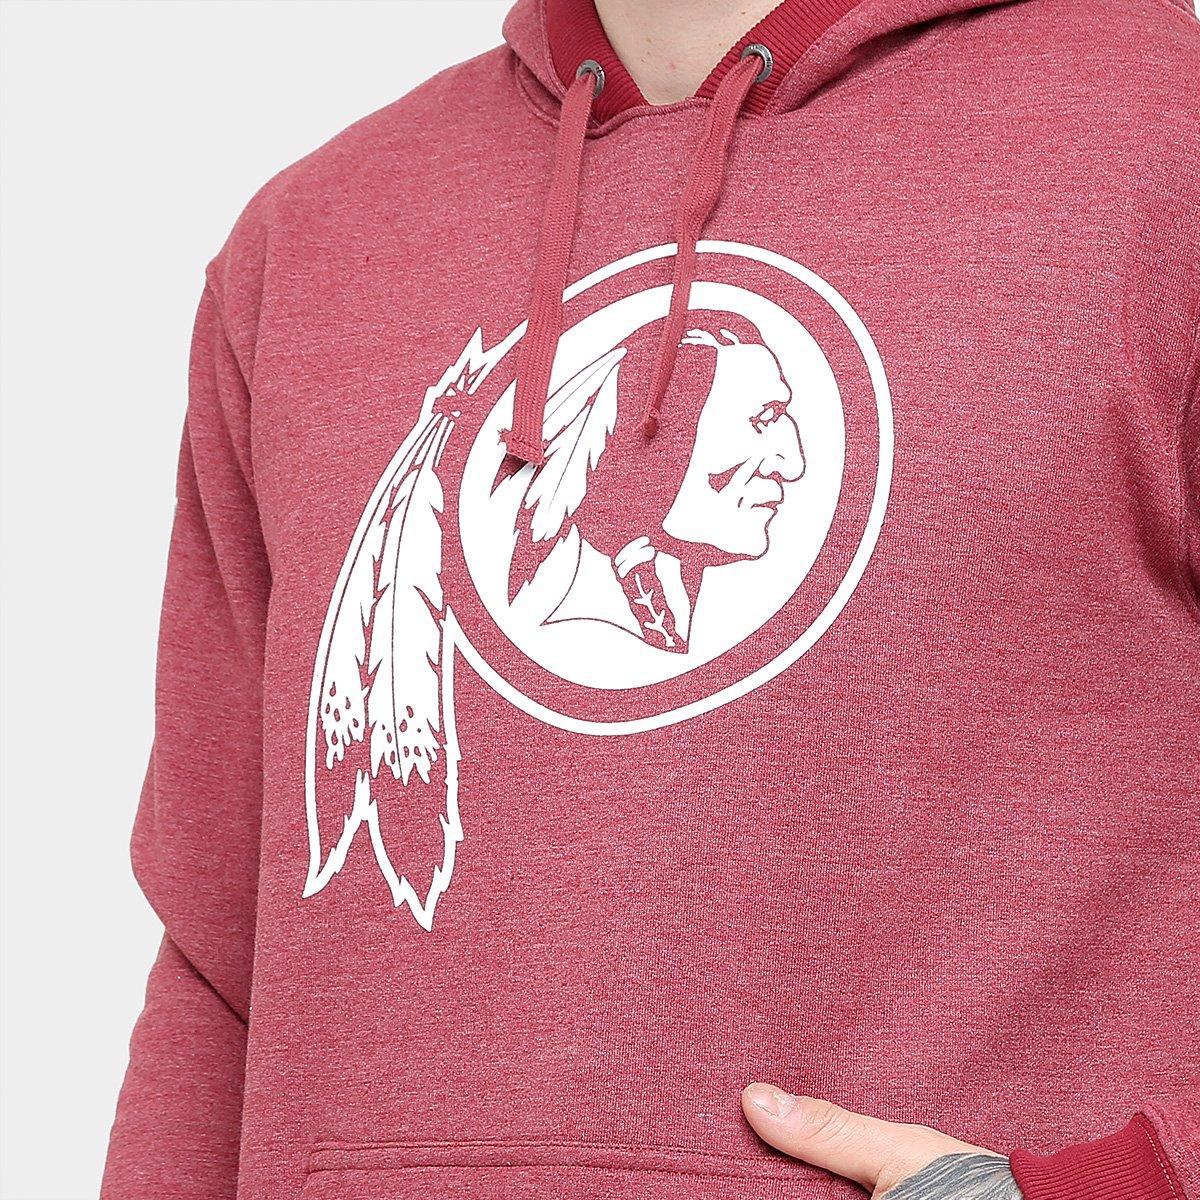 Moletom Washington Redskins New Era NFL Full Masculino - Compre ... d3f8777b7668d